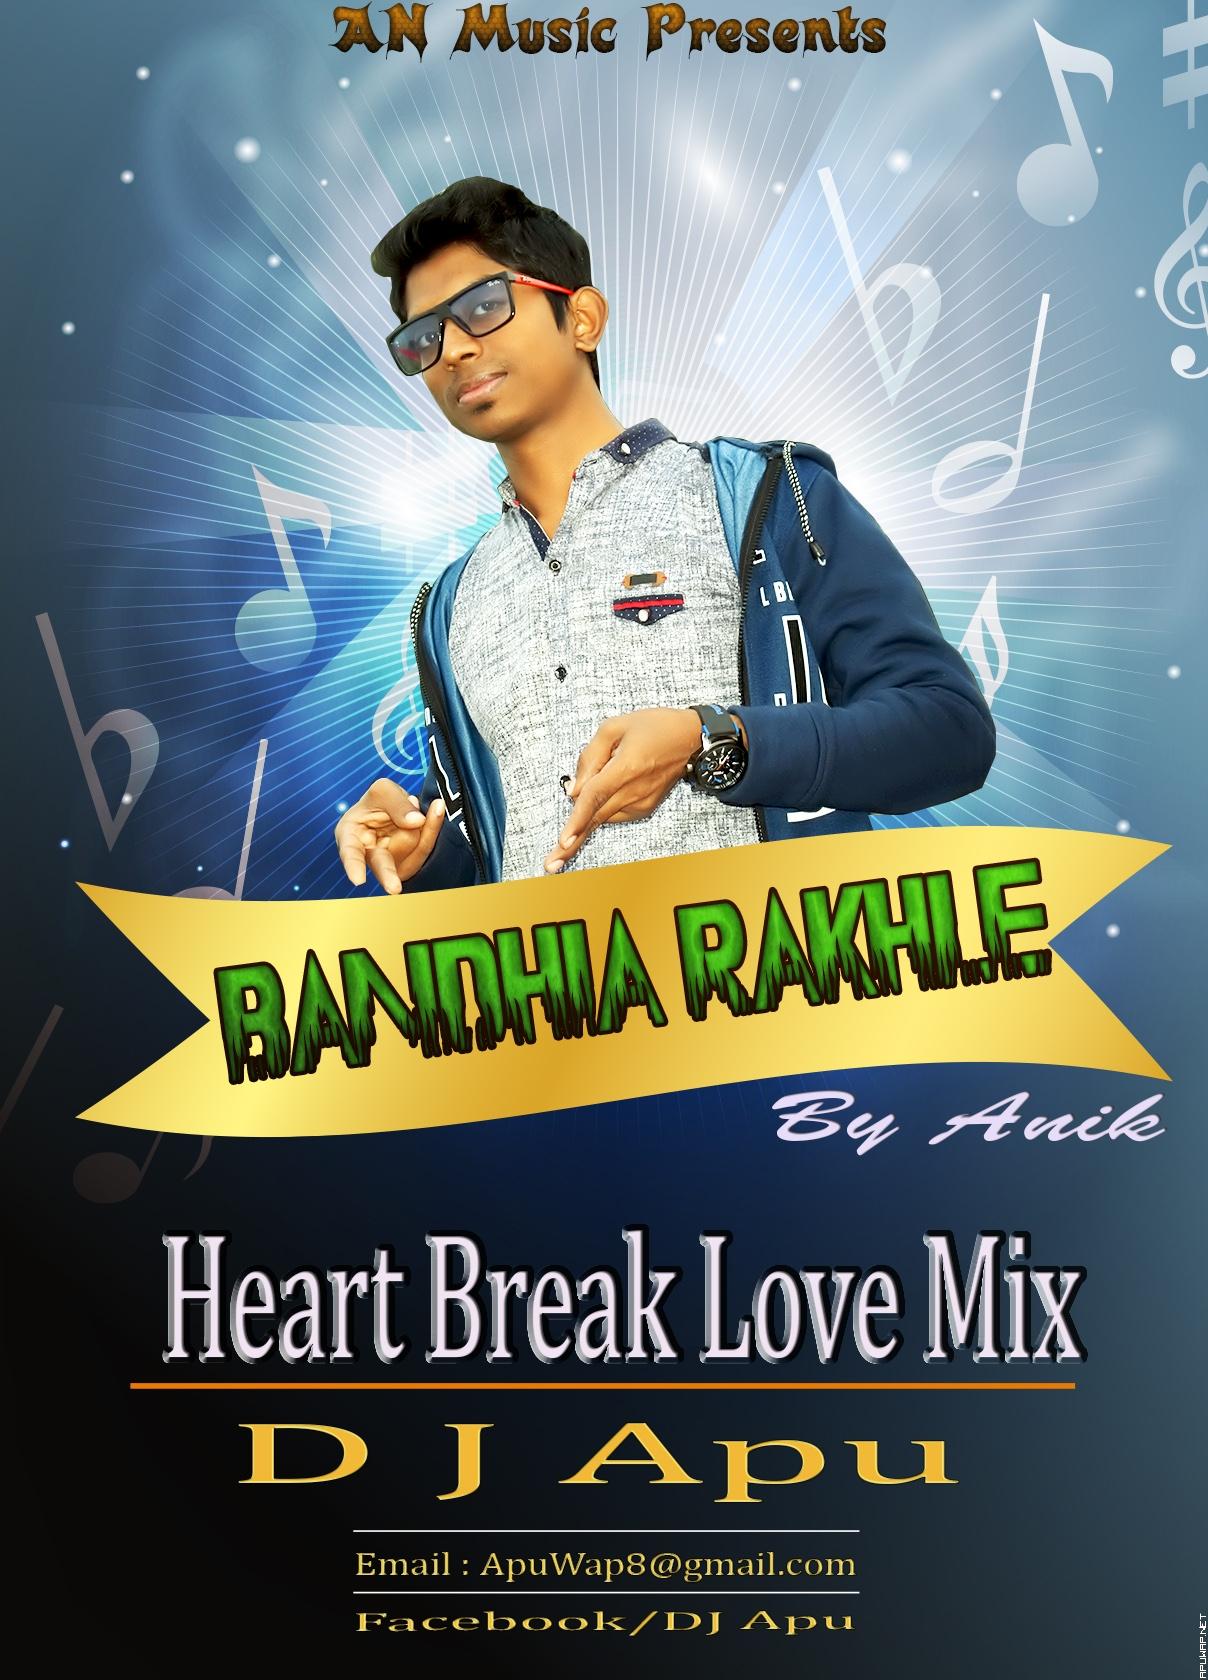 Bandhia Rakhle - By Anik (Heart Break Love Mix) DJ Apu [ApuWap.Net].mp3